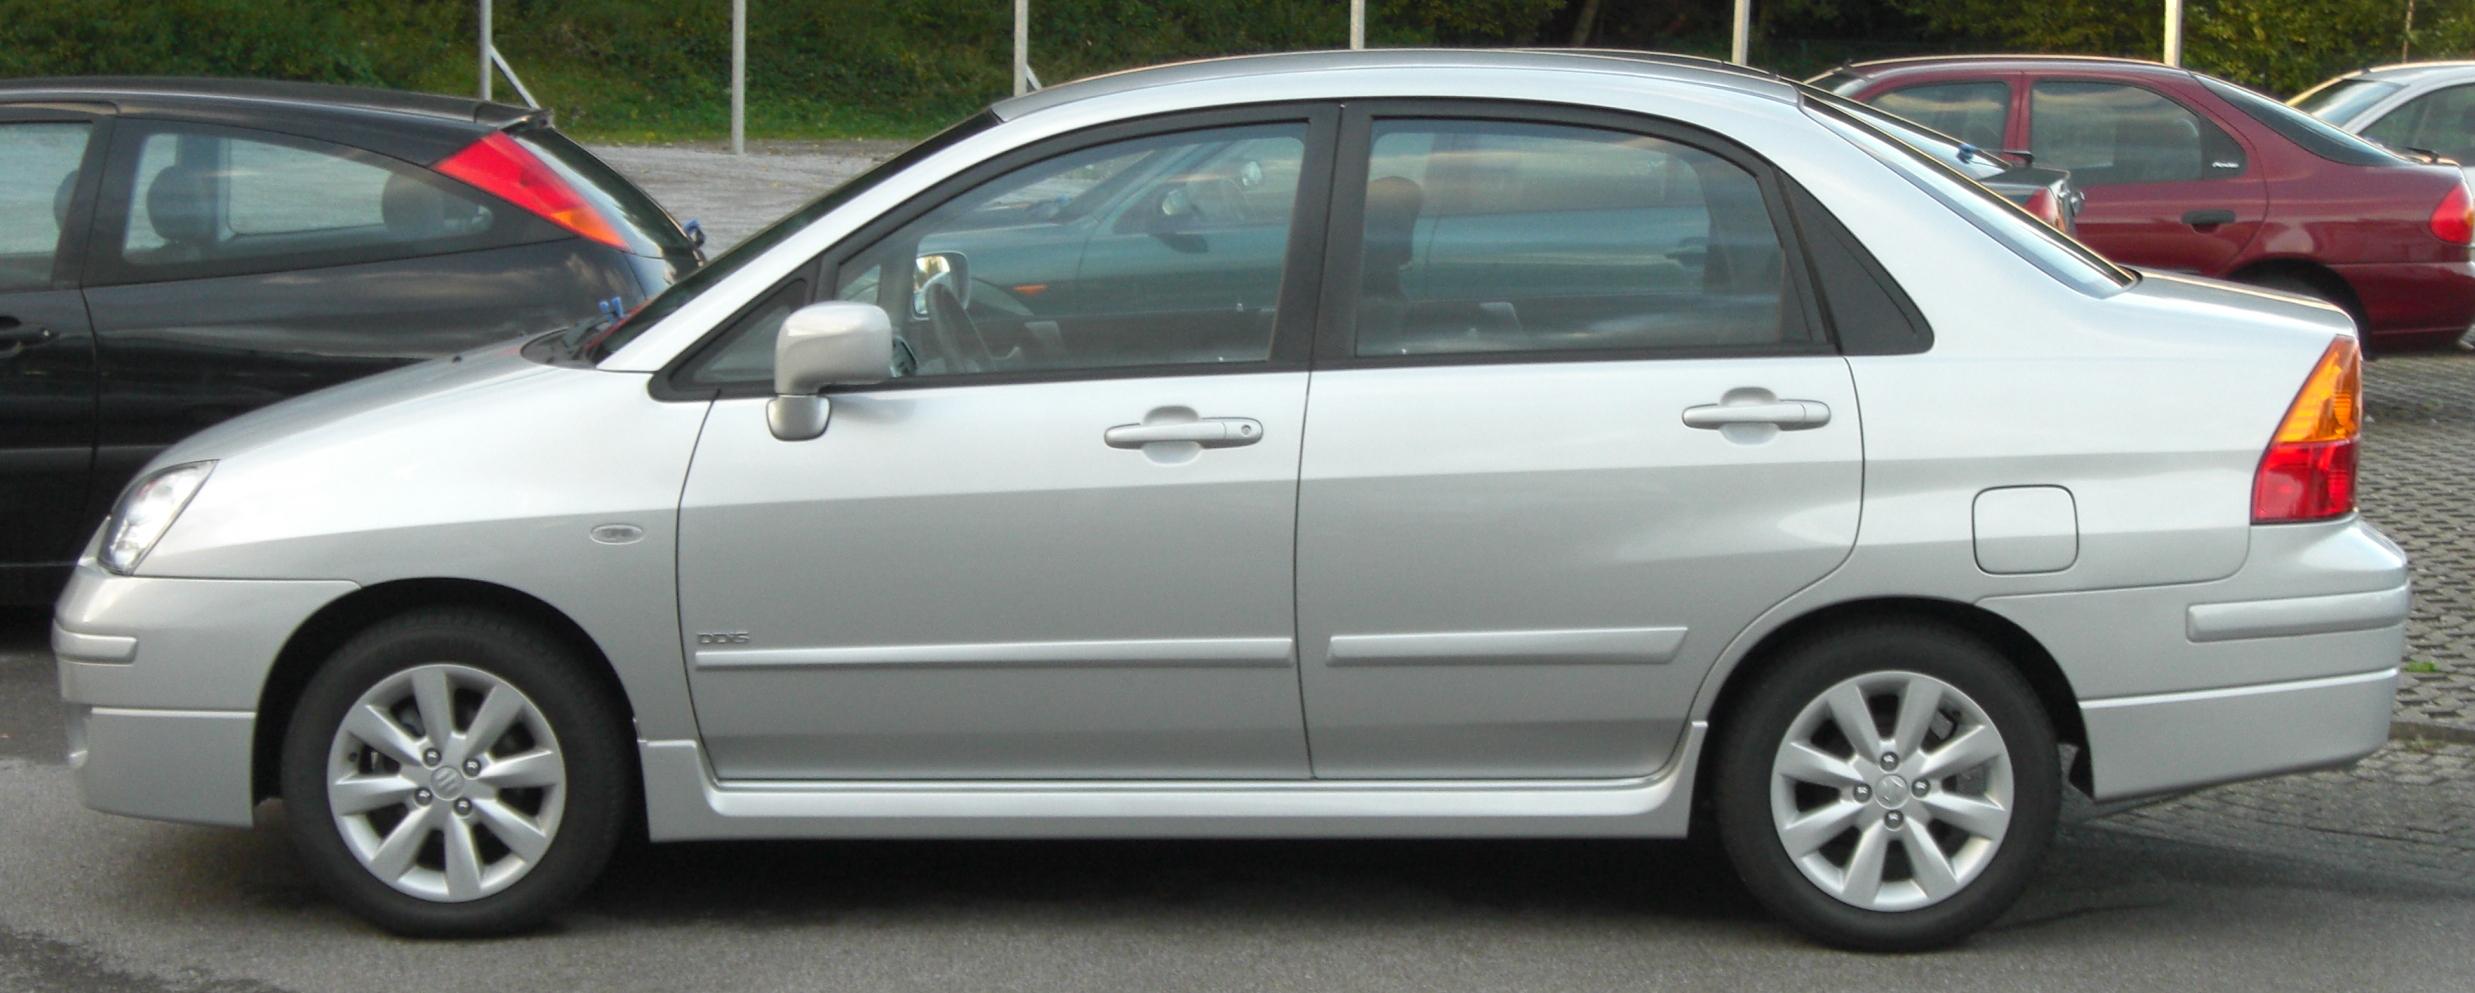 2003 suzuki liana 1 6 sedan related infomation specifications weili automotive network. Black Bedroom Furniture Sets. Home Design Ideas